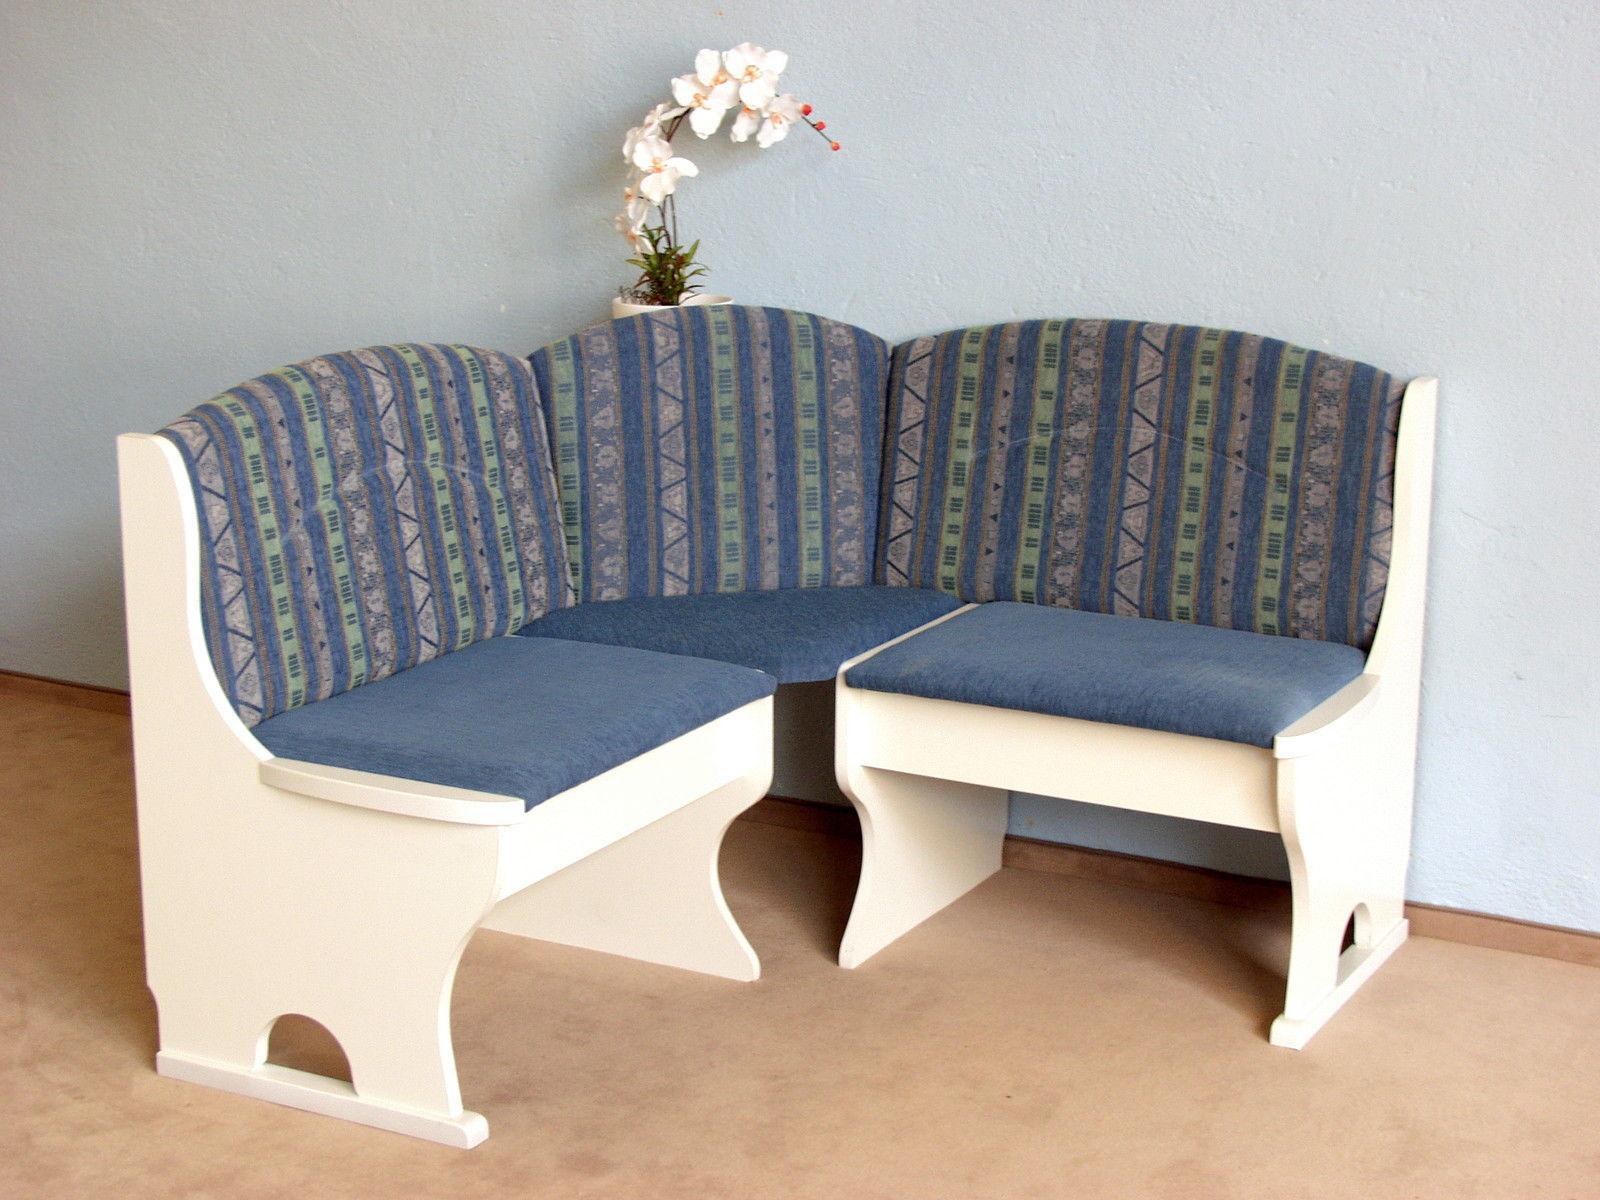 Eckbankgruppe weiß plaume eckbank truheneckbank tisch stühle ...